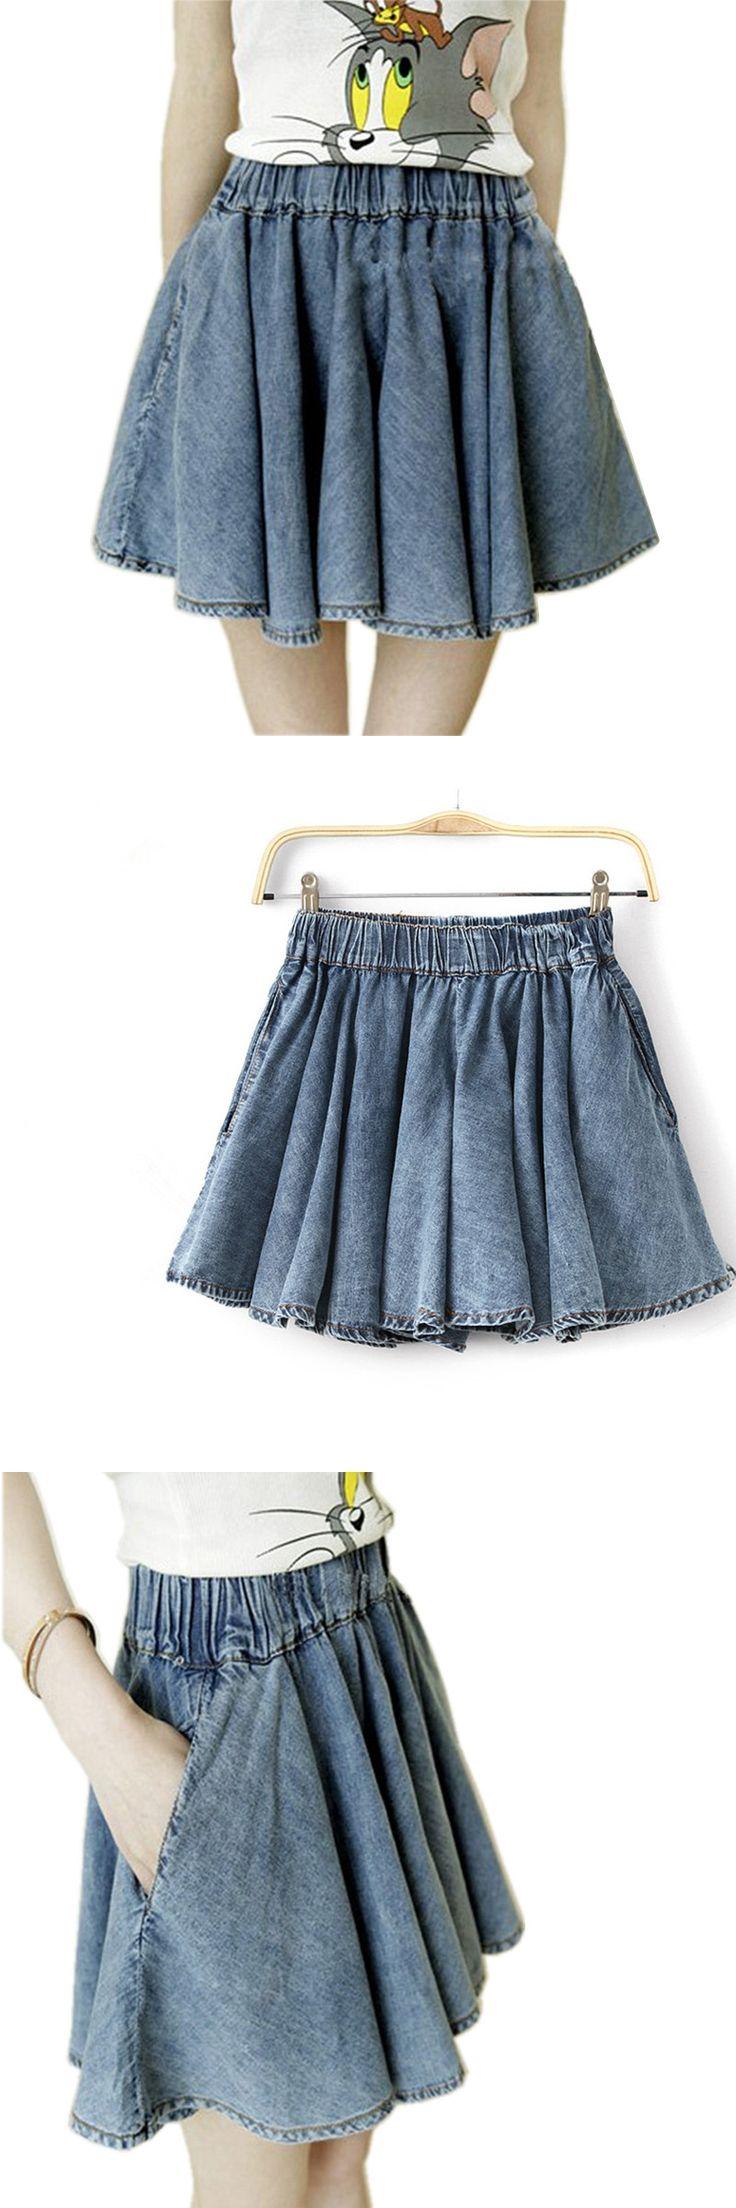 2017 New Summer Fashion Casual Womens Denim Skirts female Elastic Waist Jeans Culottes Short Skirt jupes mujer